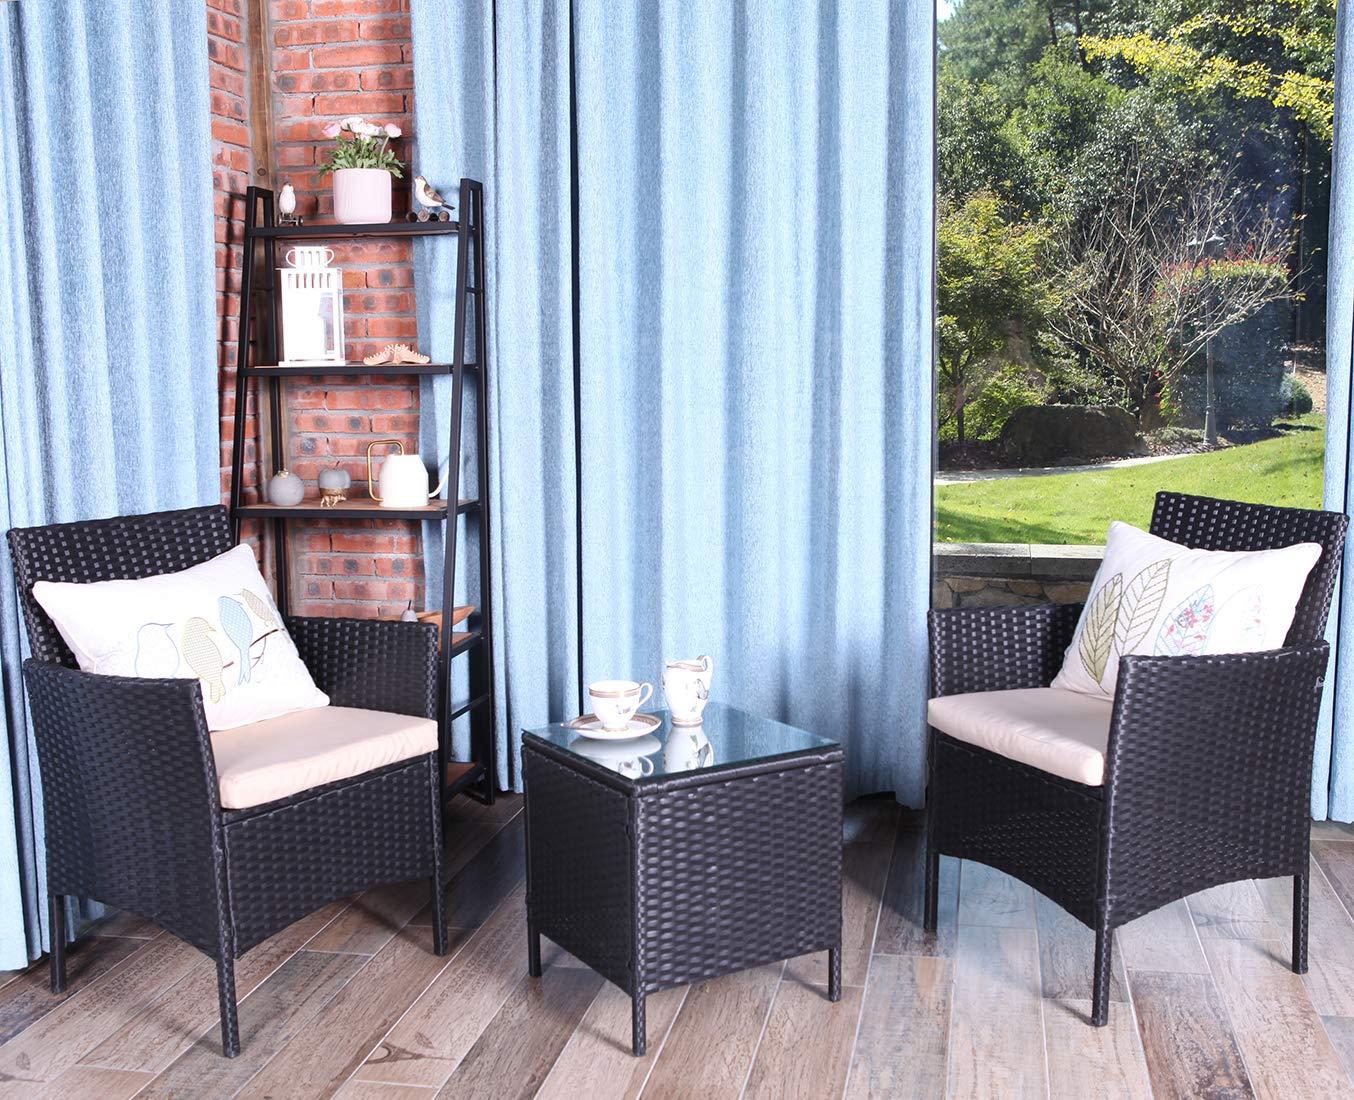 UFI Outdoor Bistro Set 3 Piece Rattan Chair Wicker Set, Use Backyard Porch Garden Poolside Balcony RTA Furniture,Black